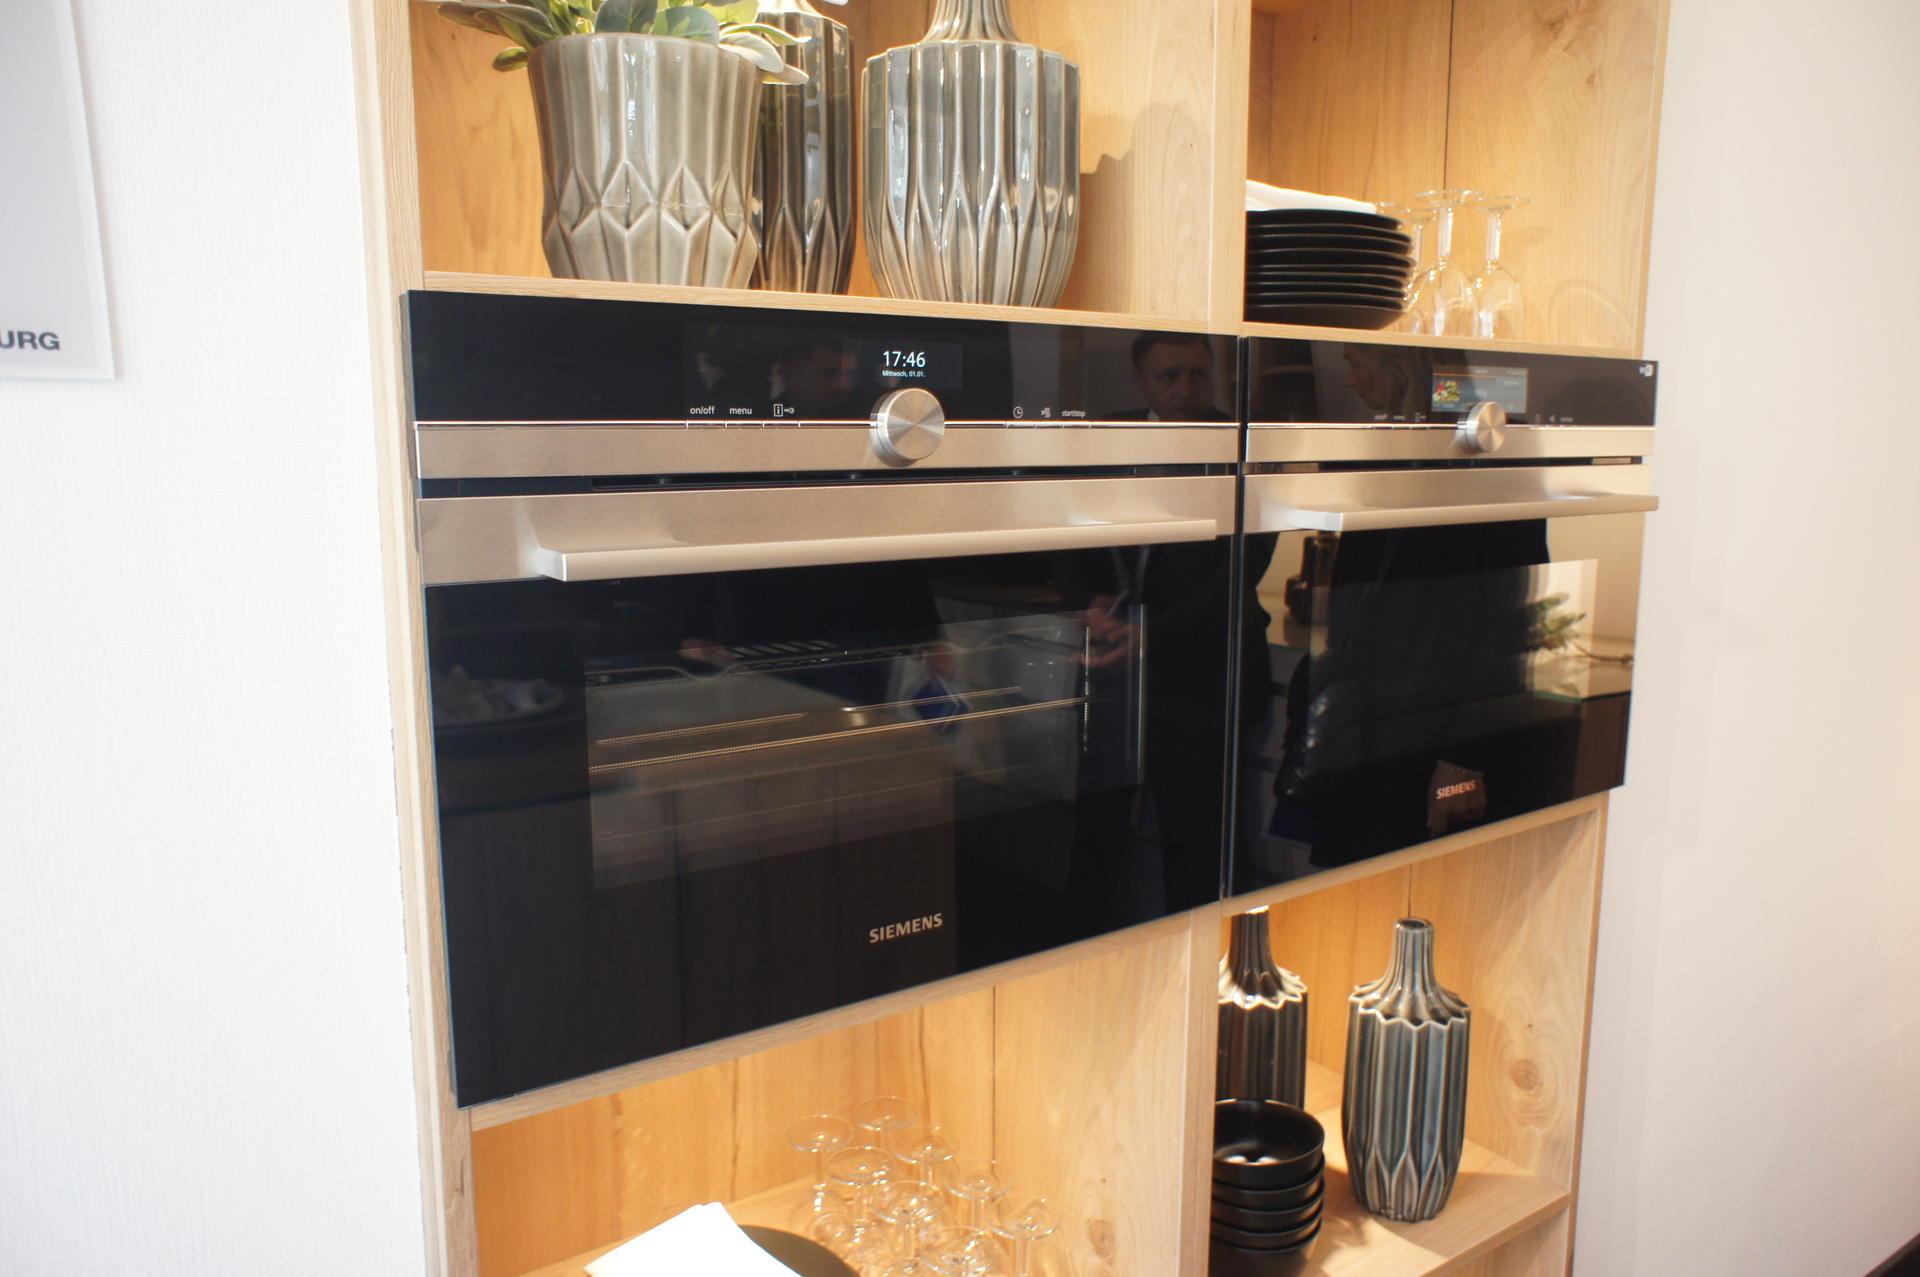 Кухня Nieburg ELEMENTS фото 11